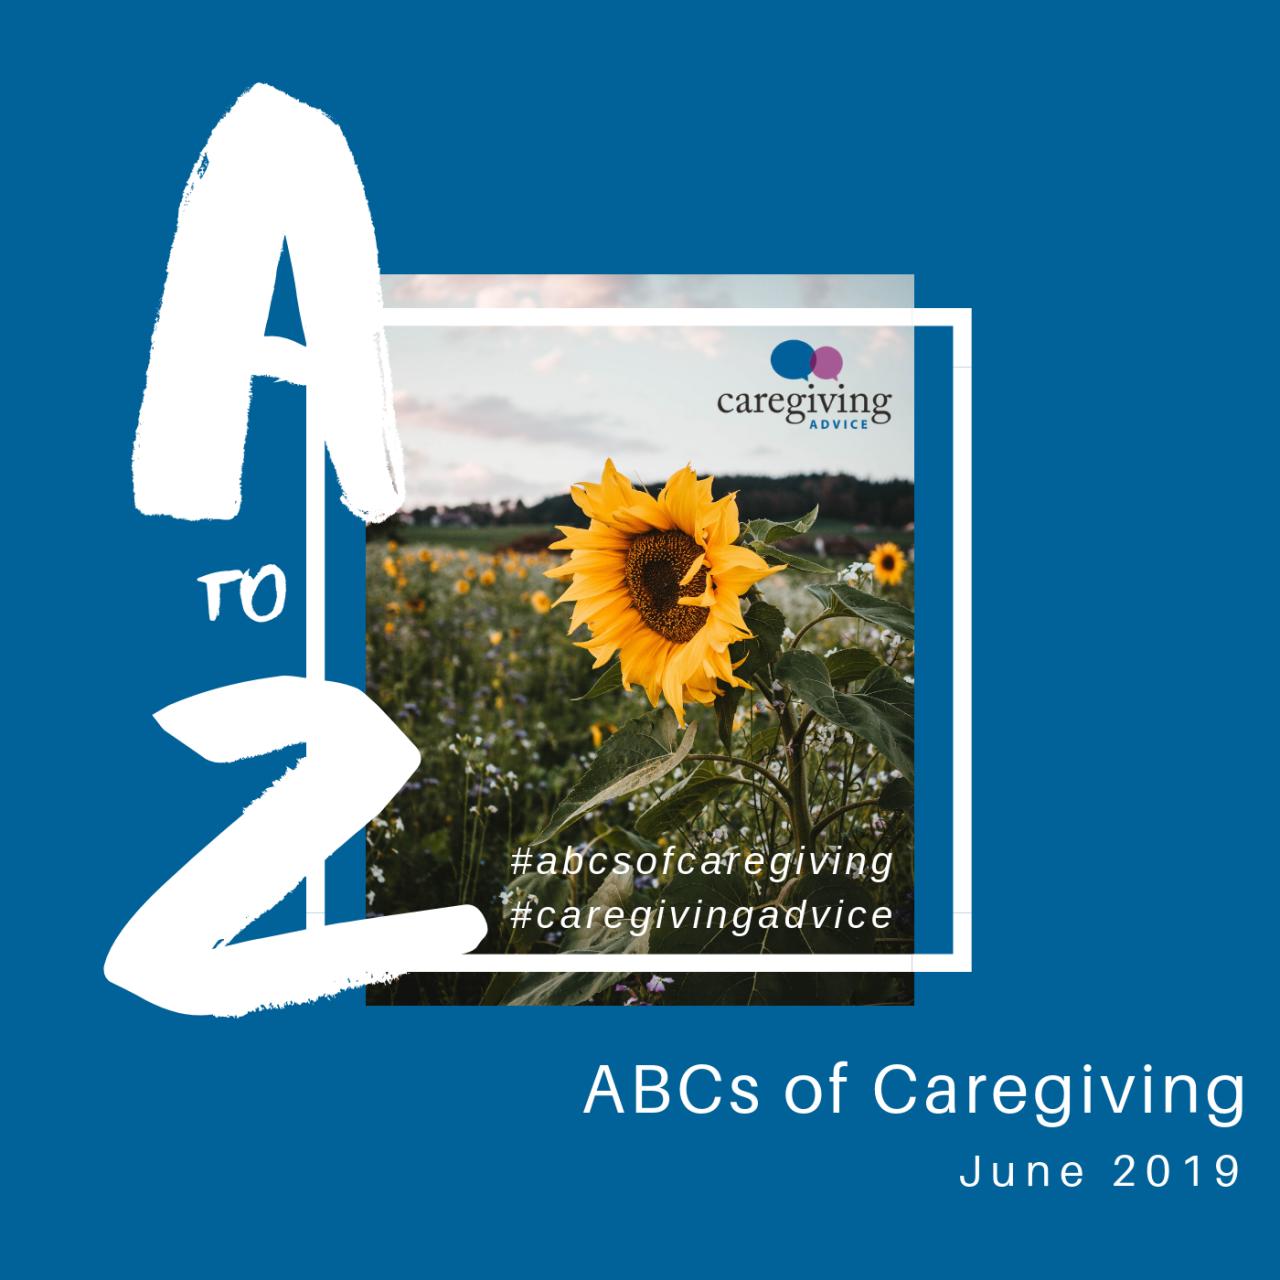 The #ABCs of Caregiving